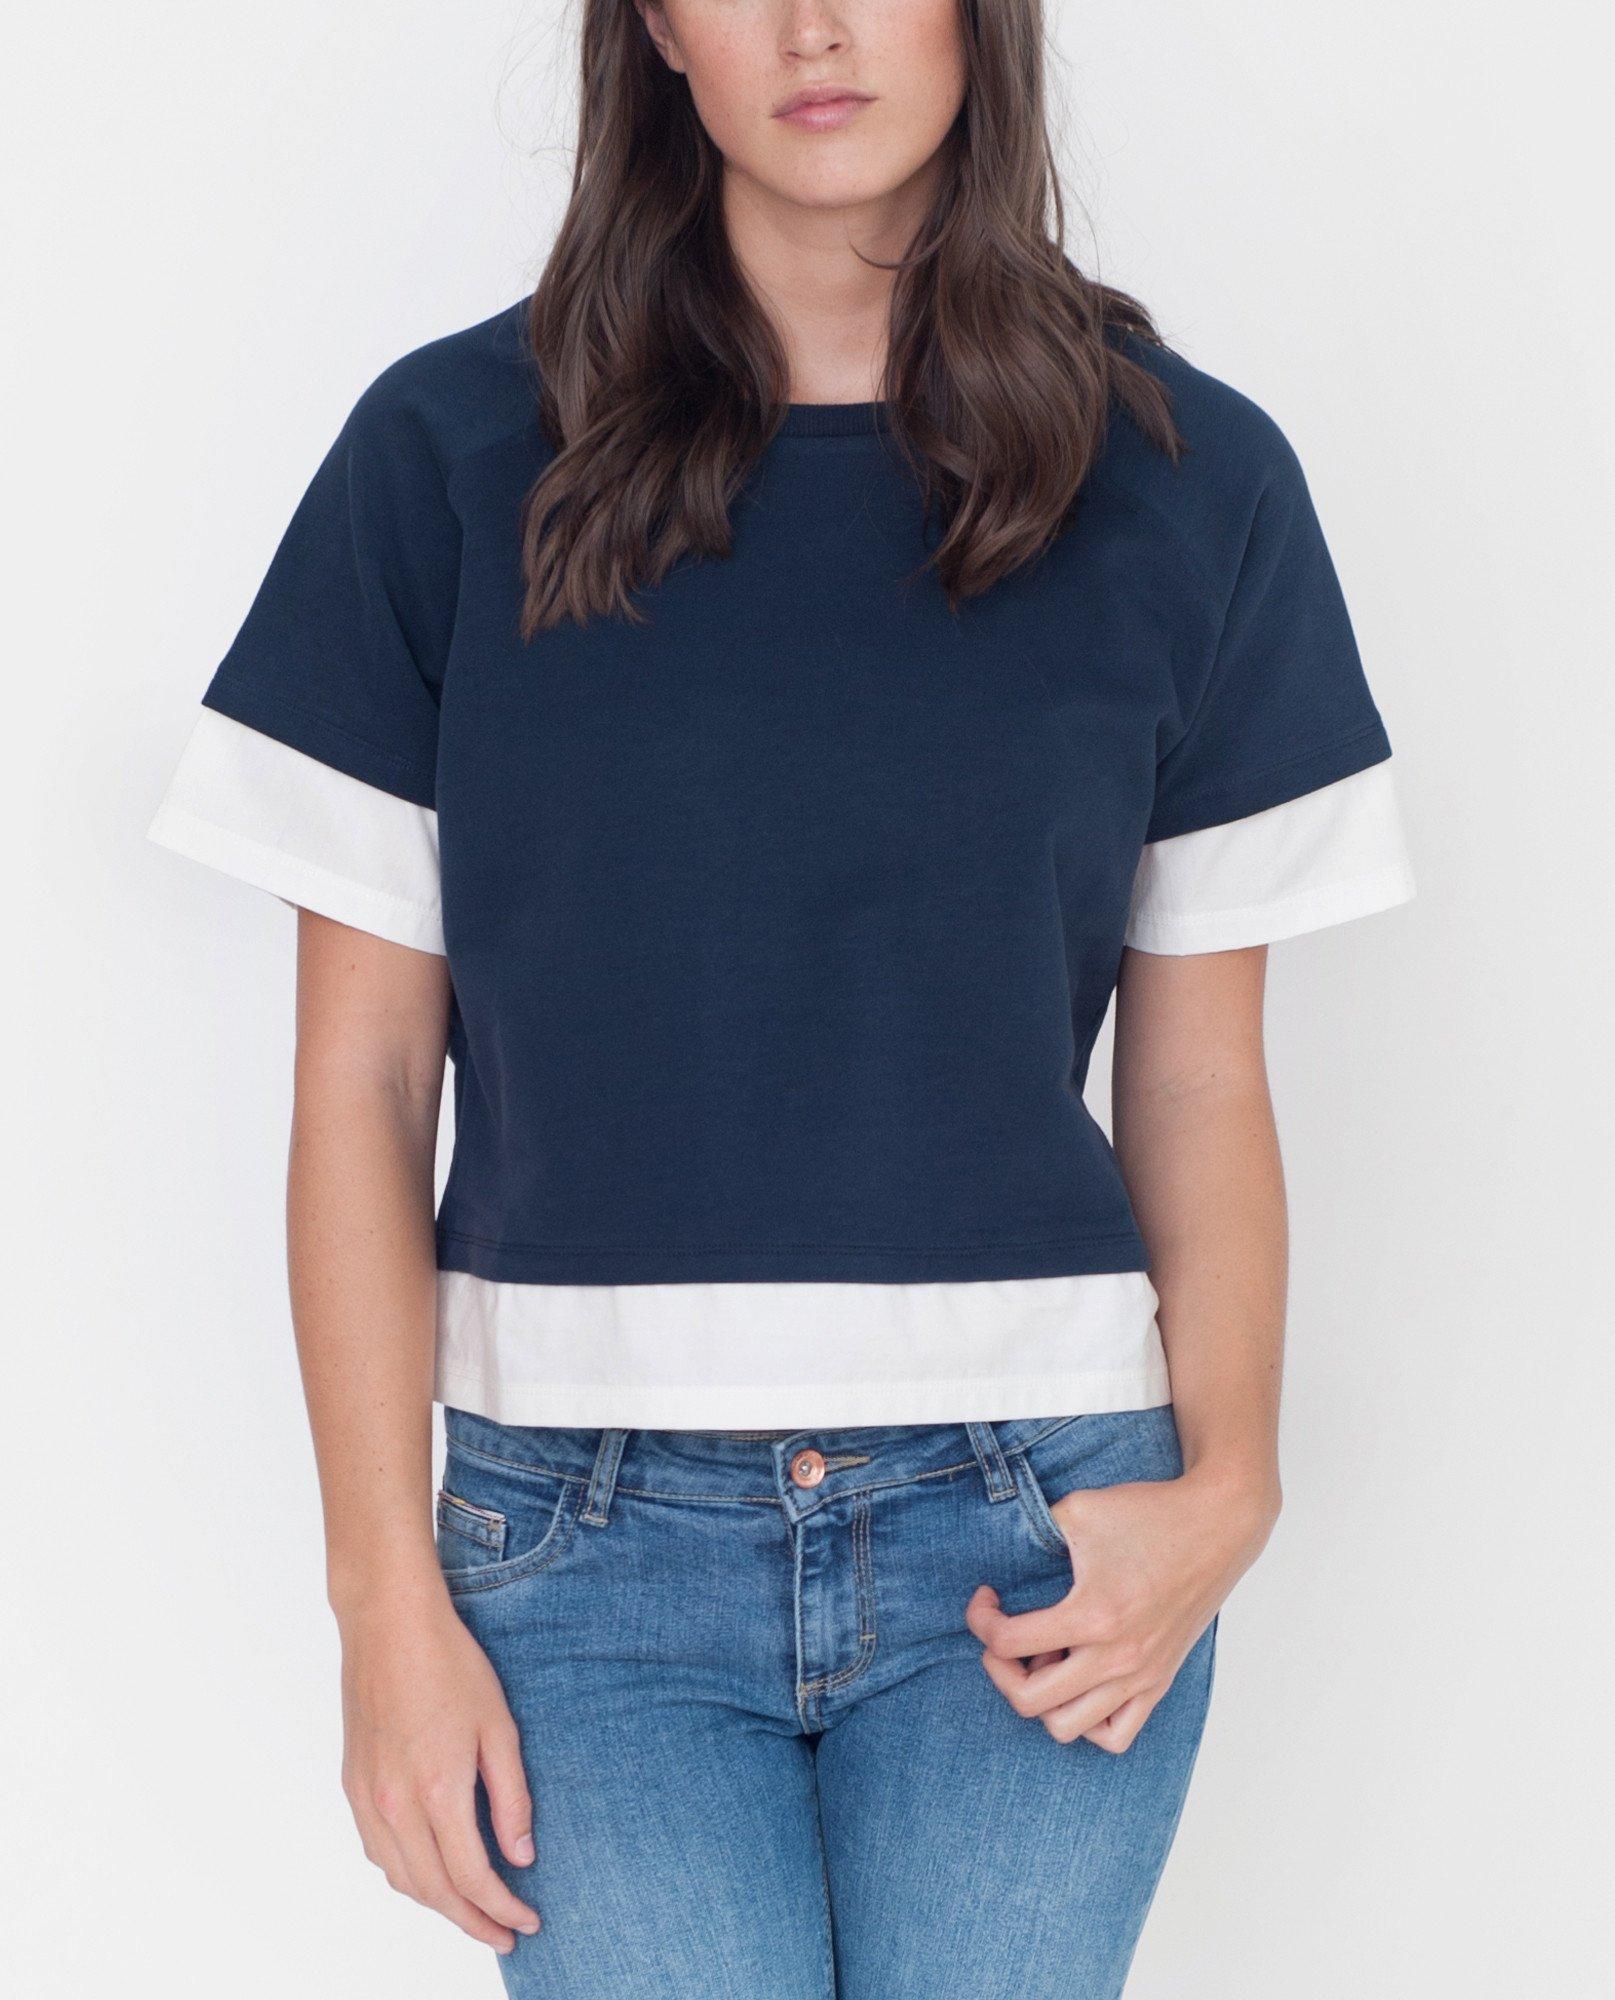 LAURA Organic Cotton Sweatshirt In Navy from Beaumont Organic